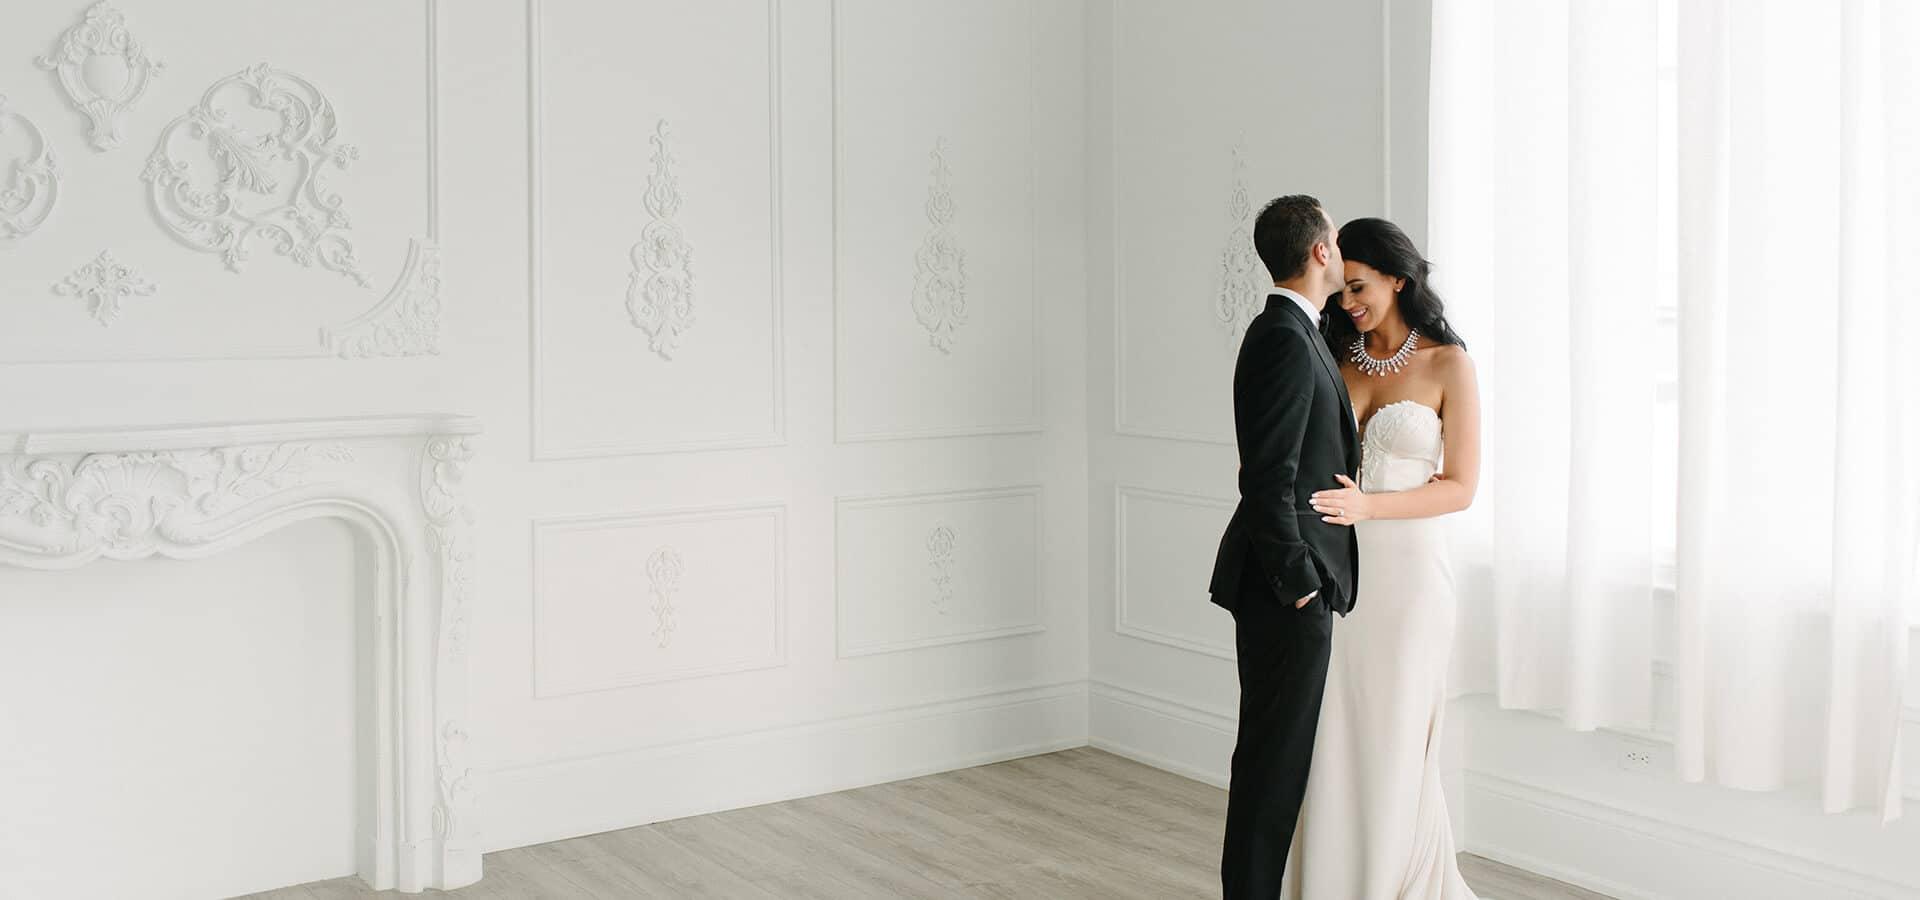 Hero image for Alexa & Nick's Elegant Wedding at Chateau Le Parc